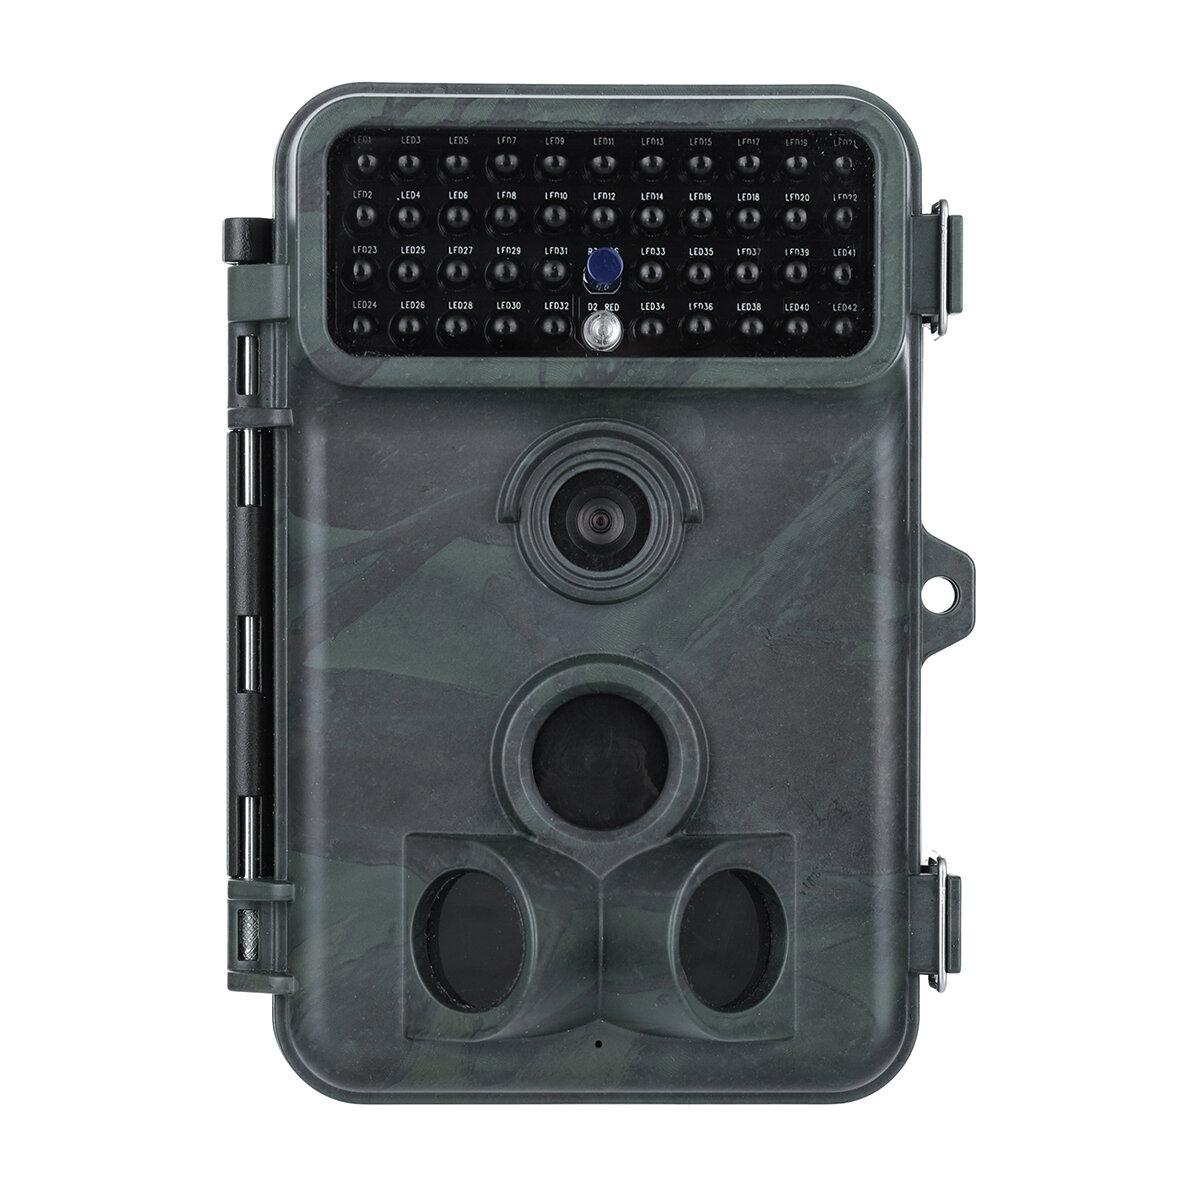 2.4 Inch 16MP 1080P PIR Sensor Impermeable Trail Cámara No Flash Visión nocturna Wildlife Hunting Cámara